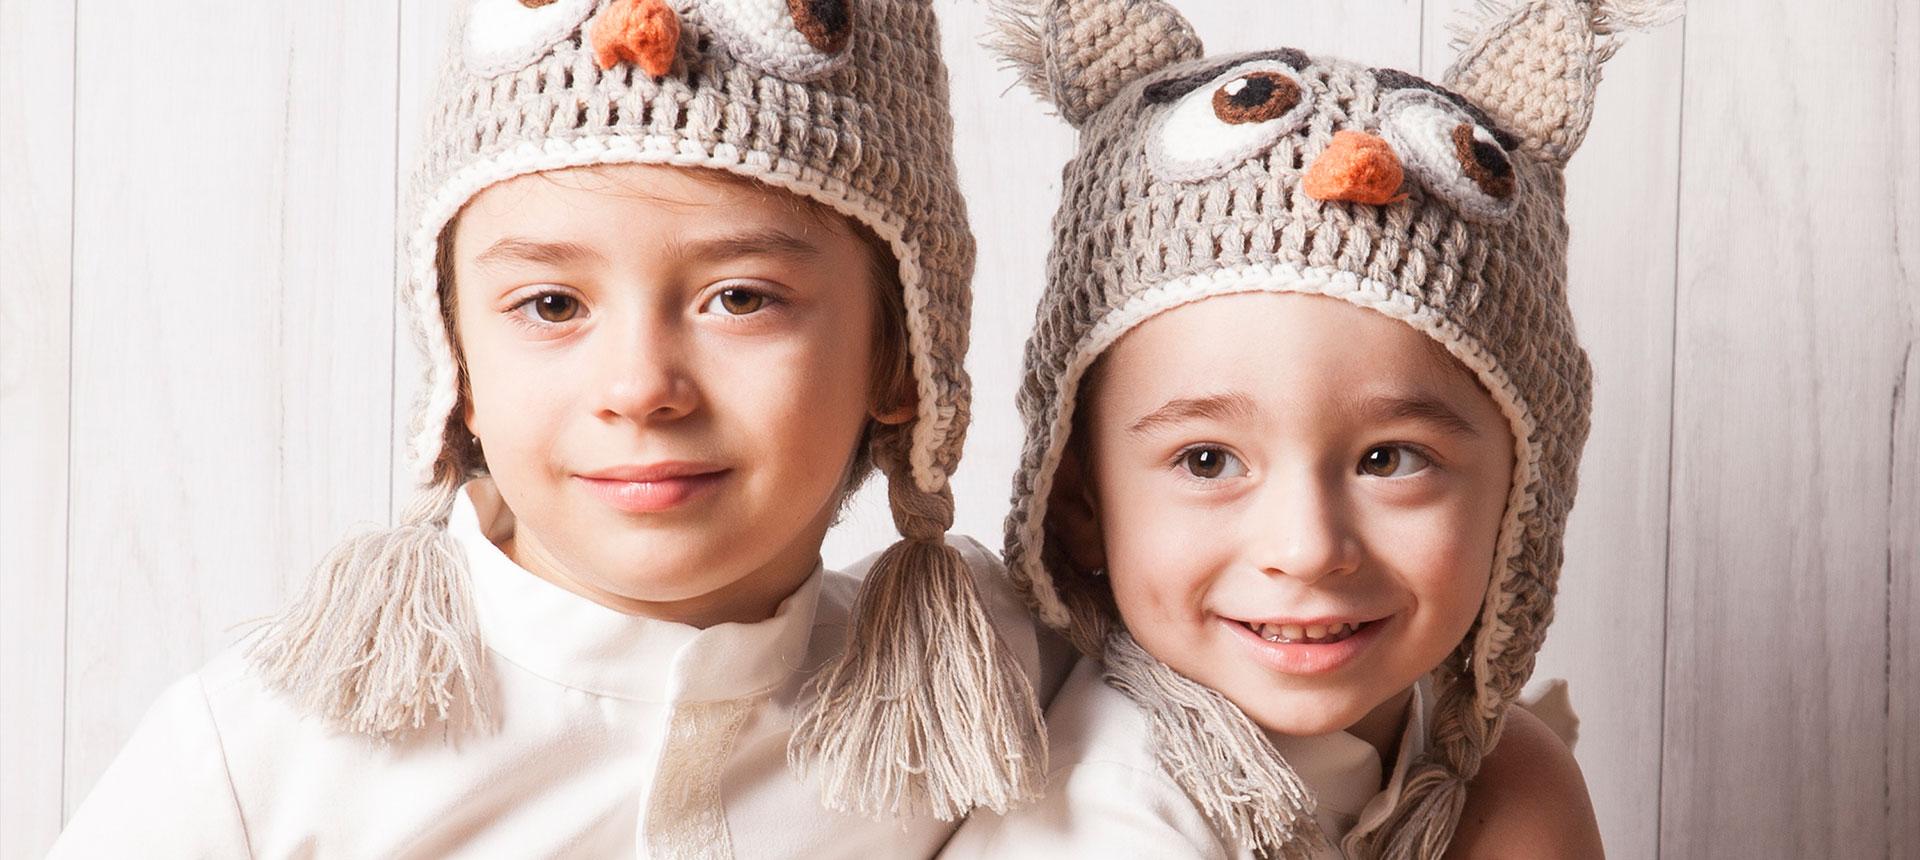 fotografia-infantil-felguera-fotografo-02-slide